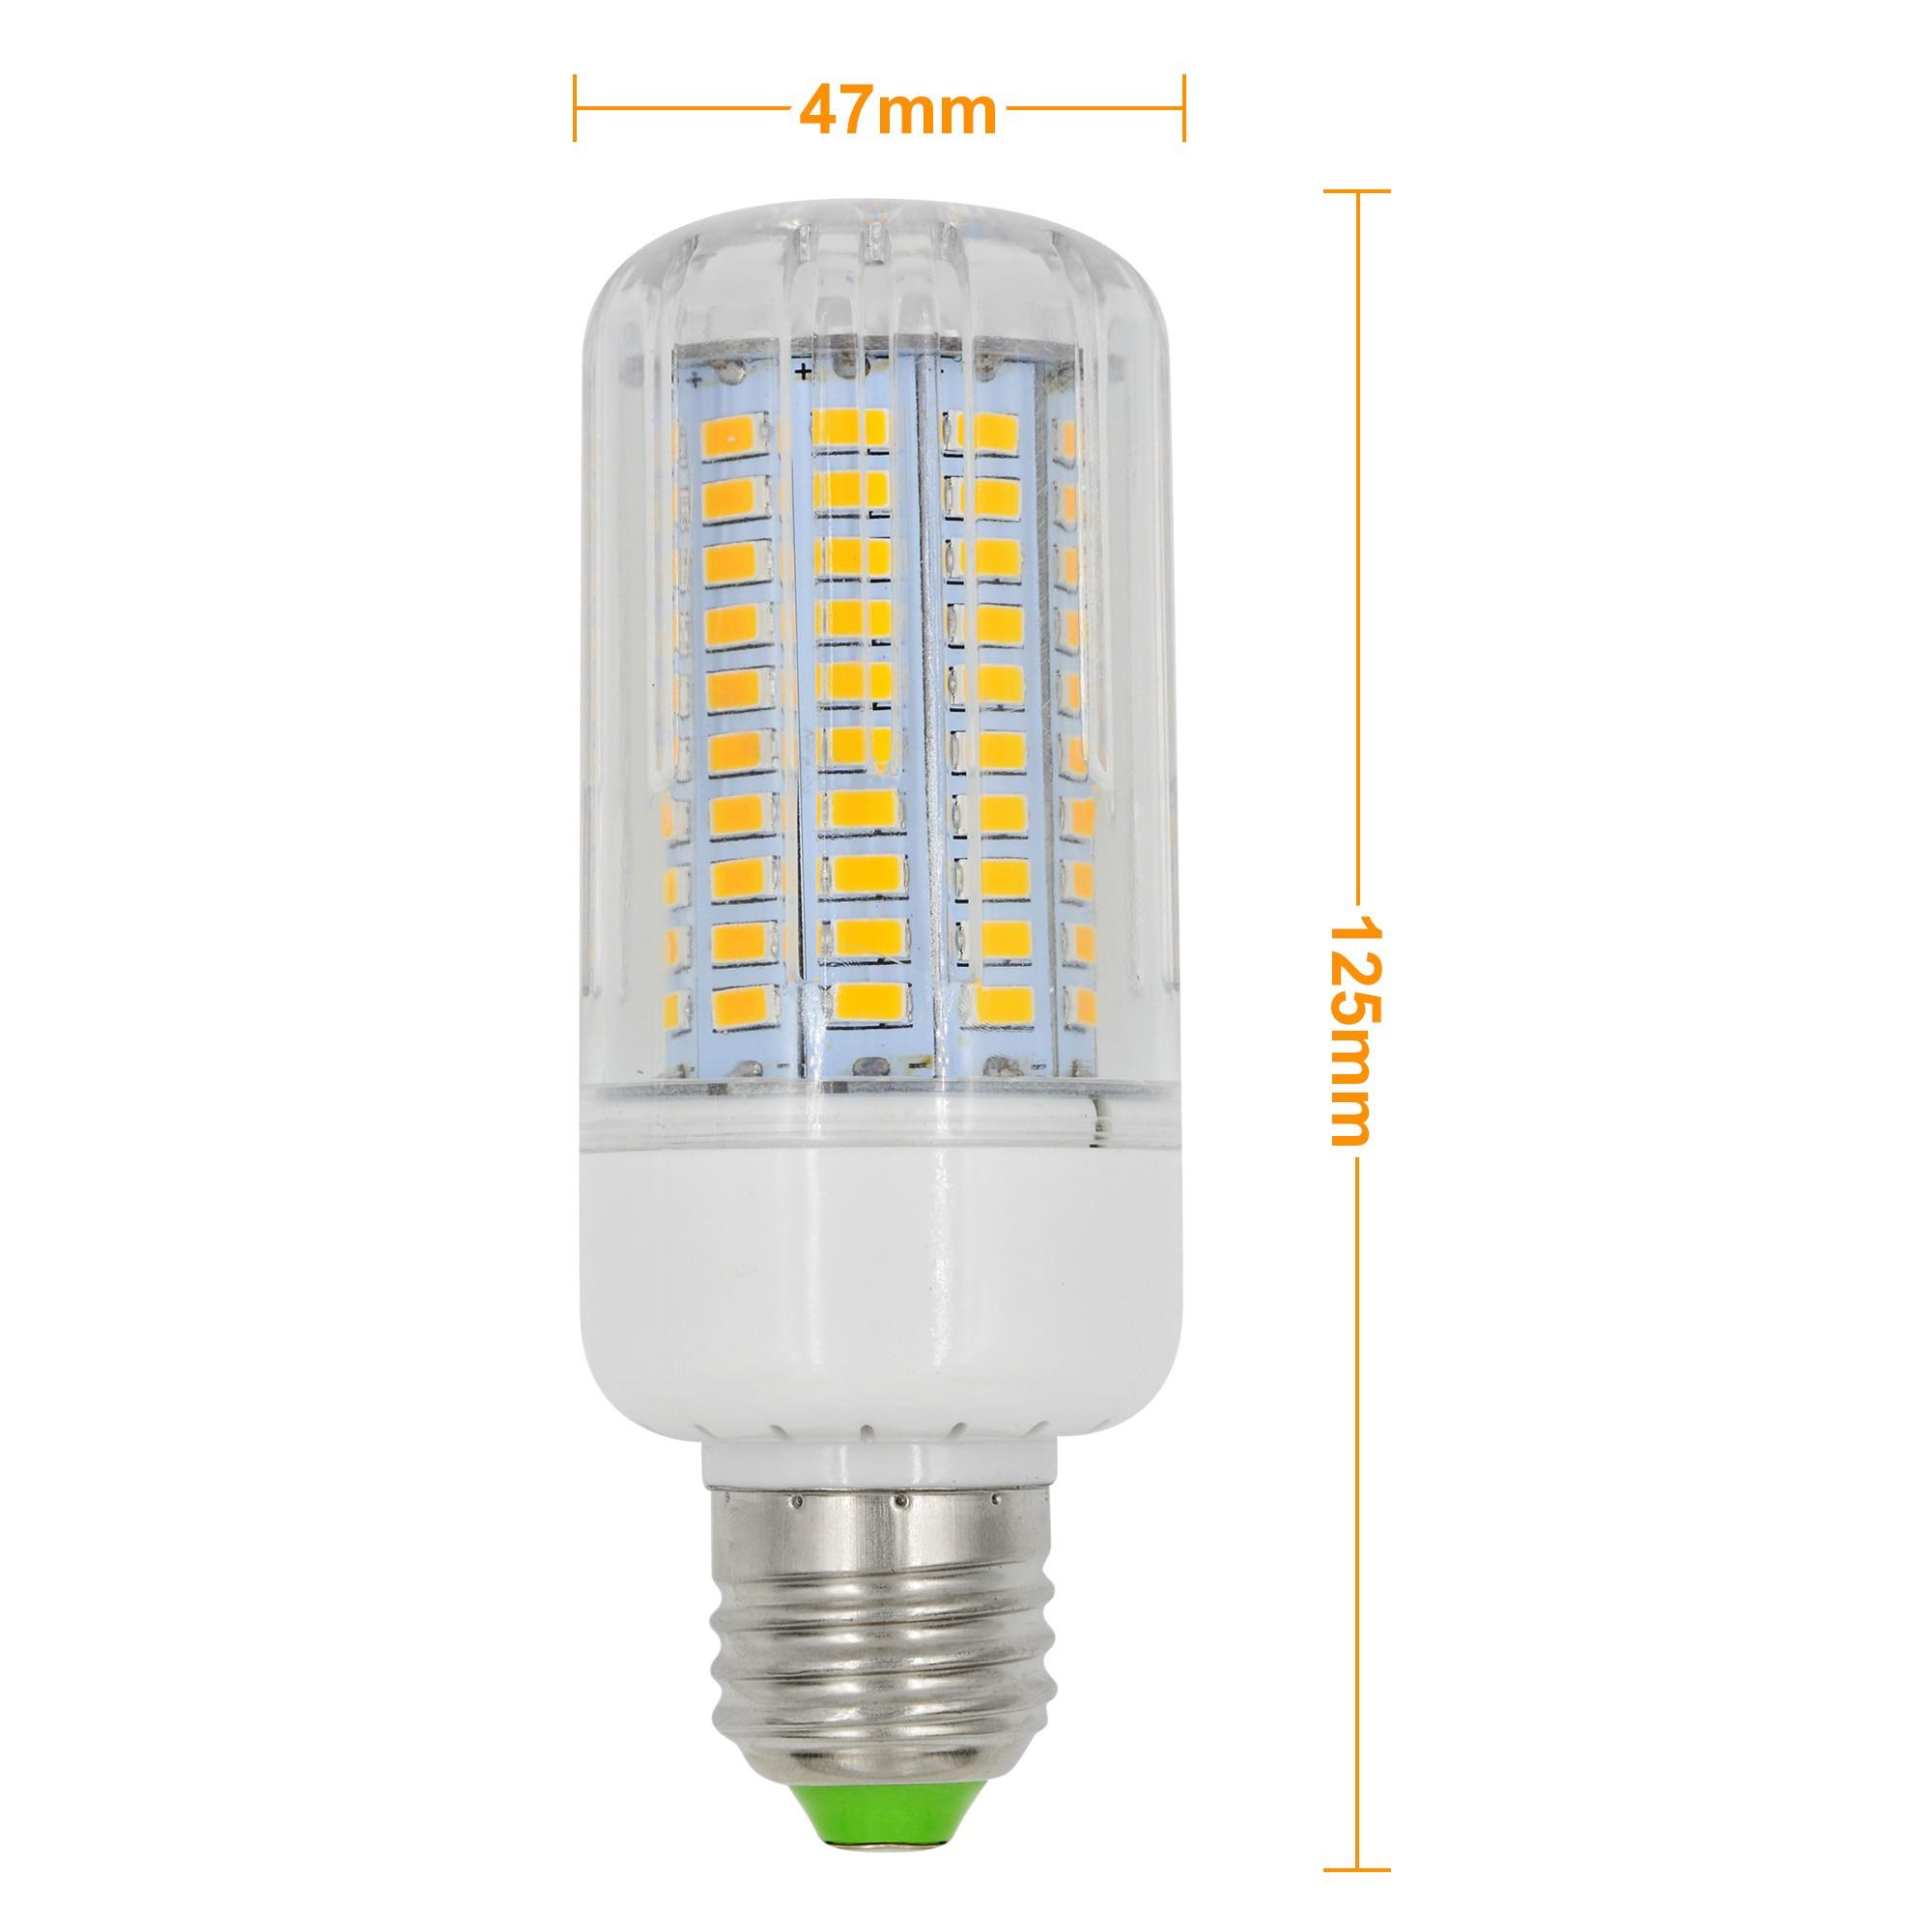 mengsled mengs e27 15w led dimmable corn light 120x 5736 smd led bulb lamp ac 220 240v in. Black Bedroom Furniture Sets. Home Design Ideas